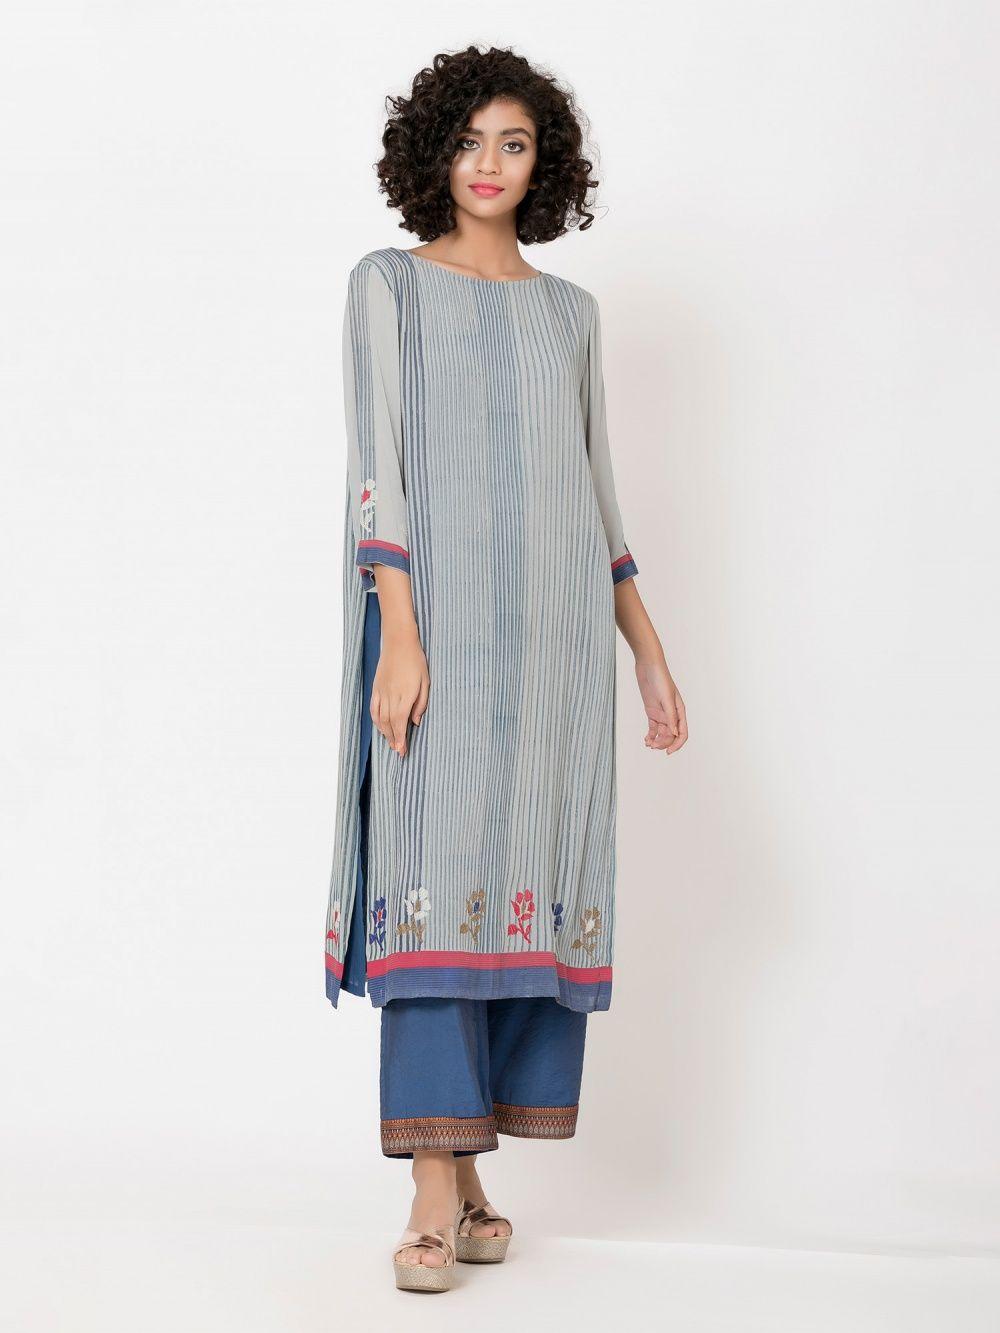 Krishna Mehta Grey Blue Embroided Tunic